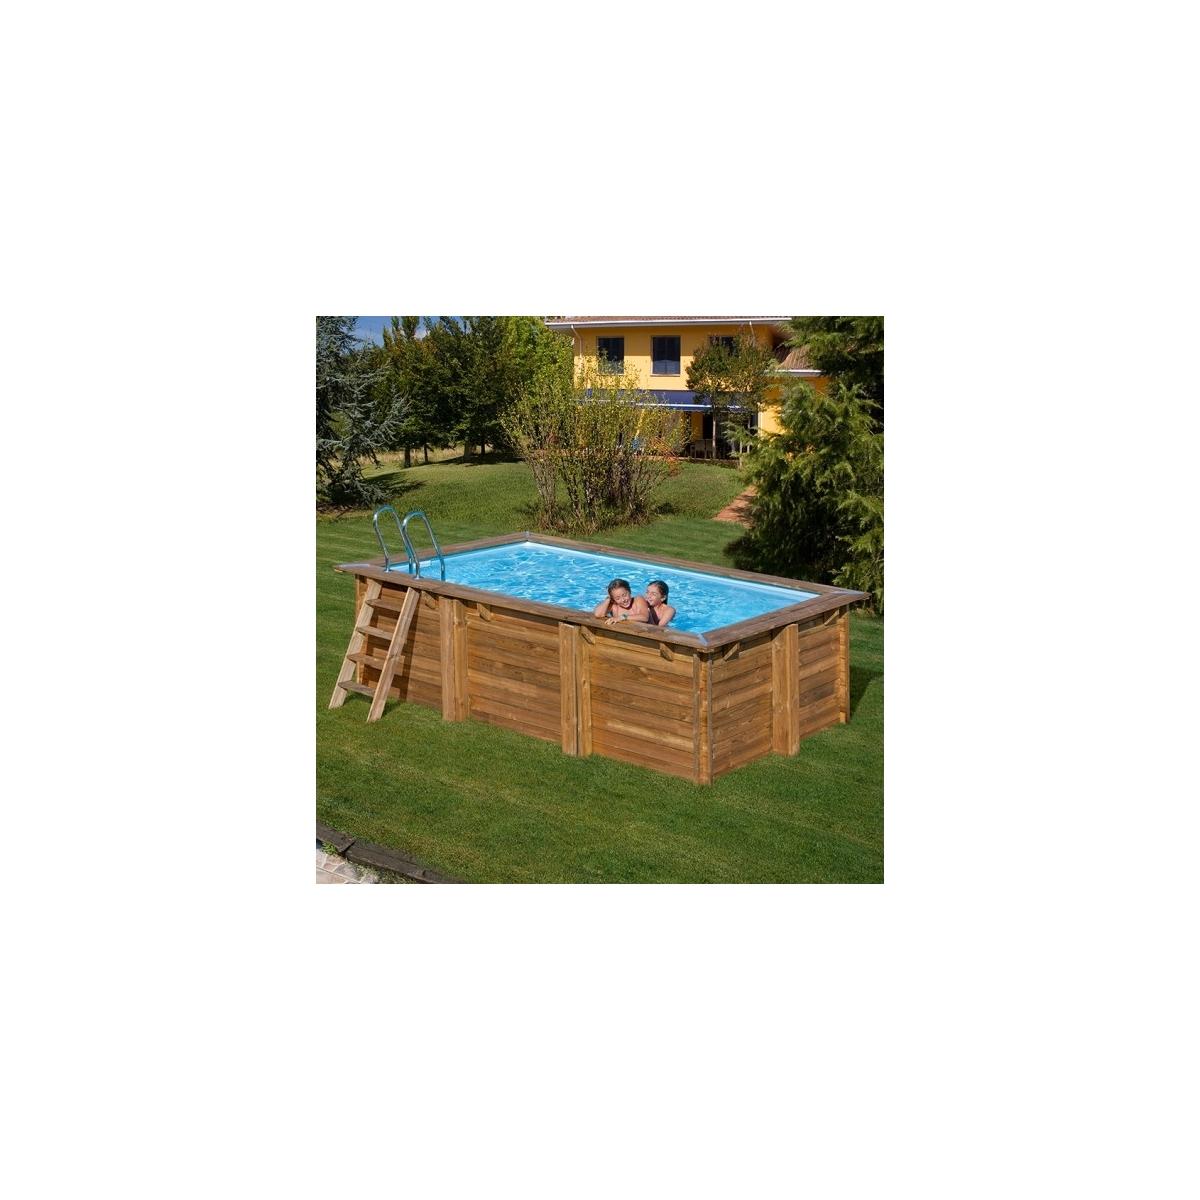 Piscina desmontable de madera Gre Sunbay Marbella rectangular 427x277x119